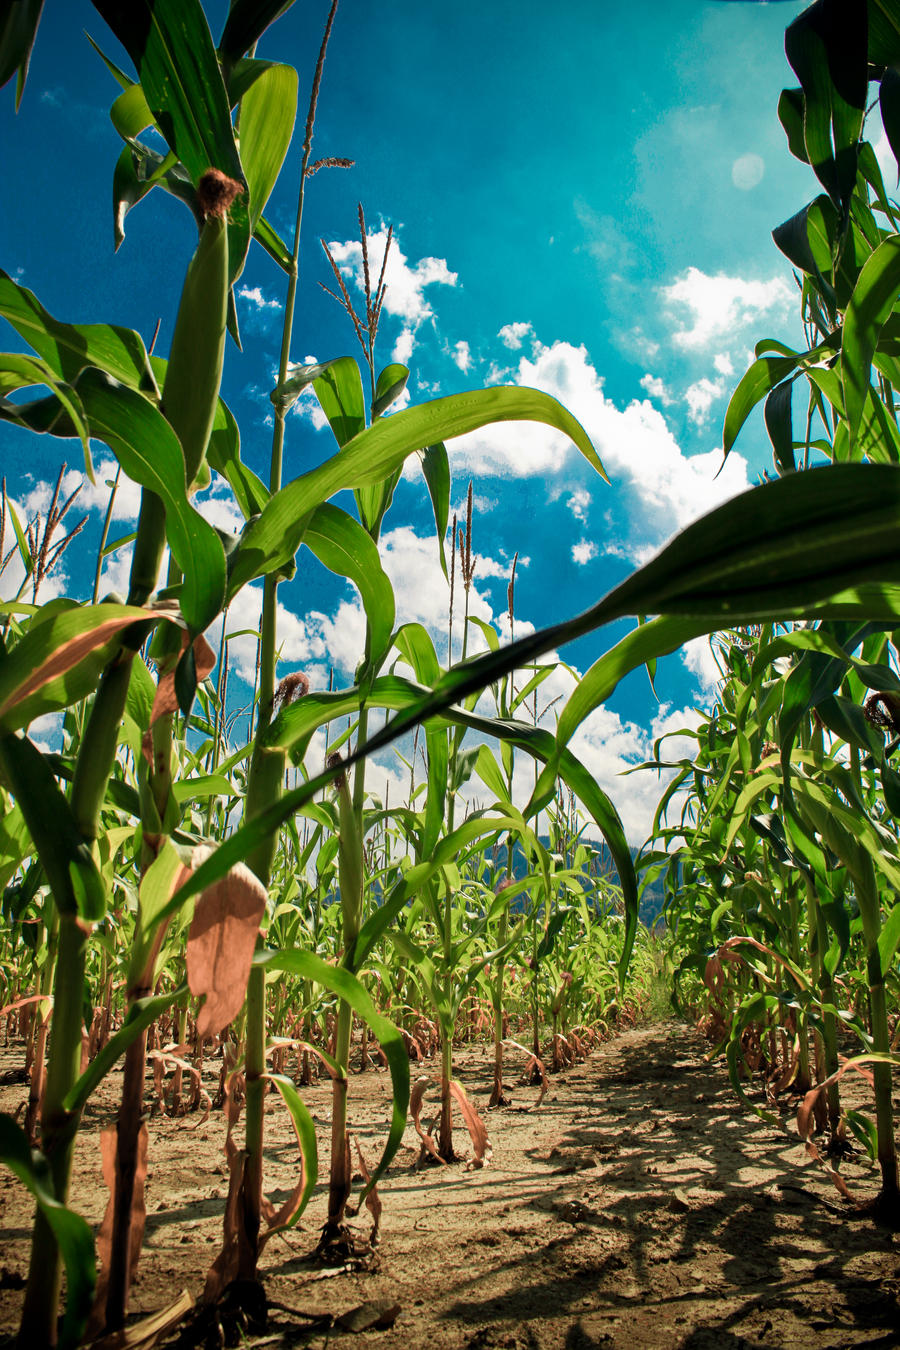 cornfield II by AgizZz